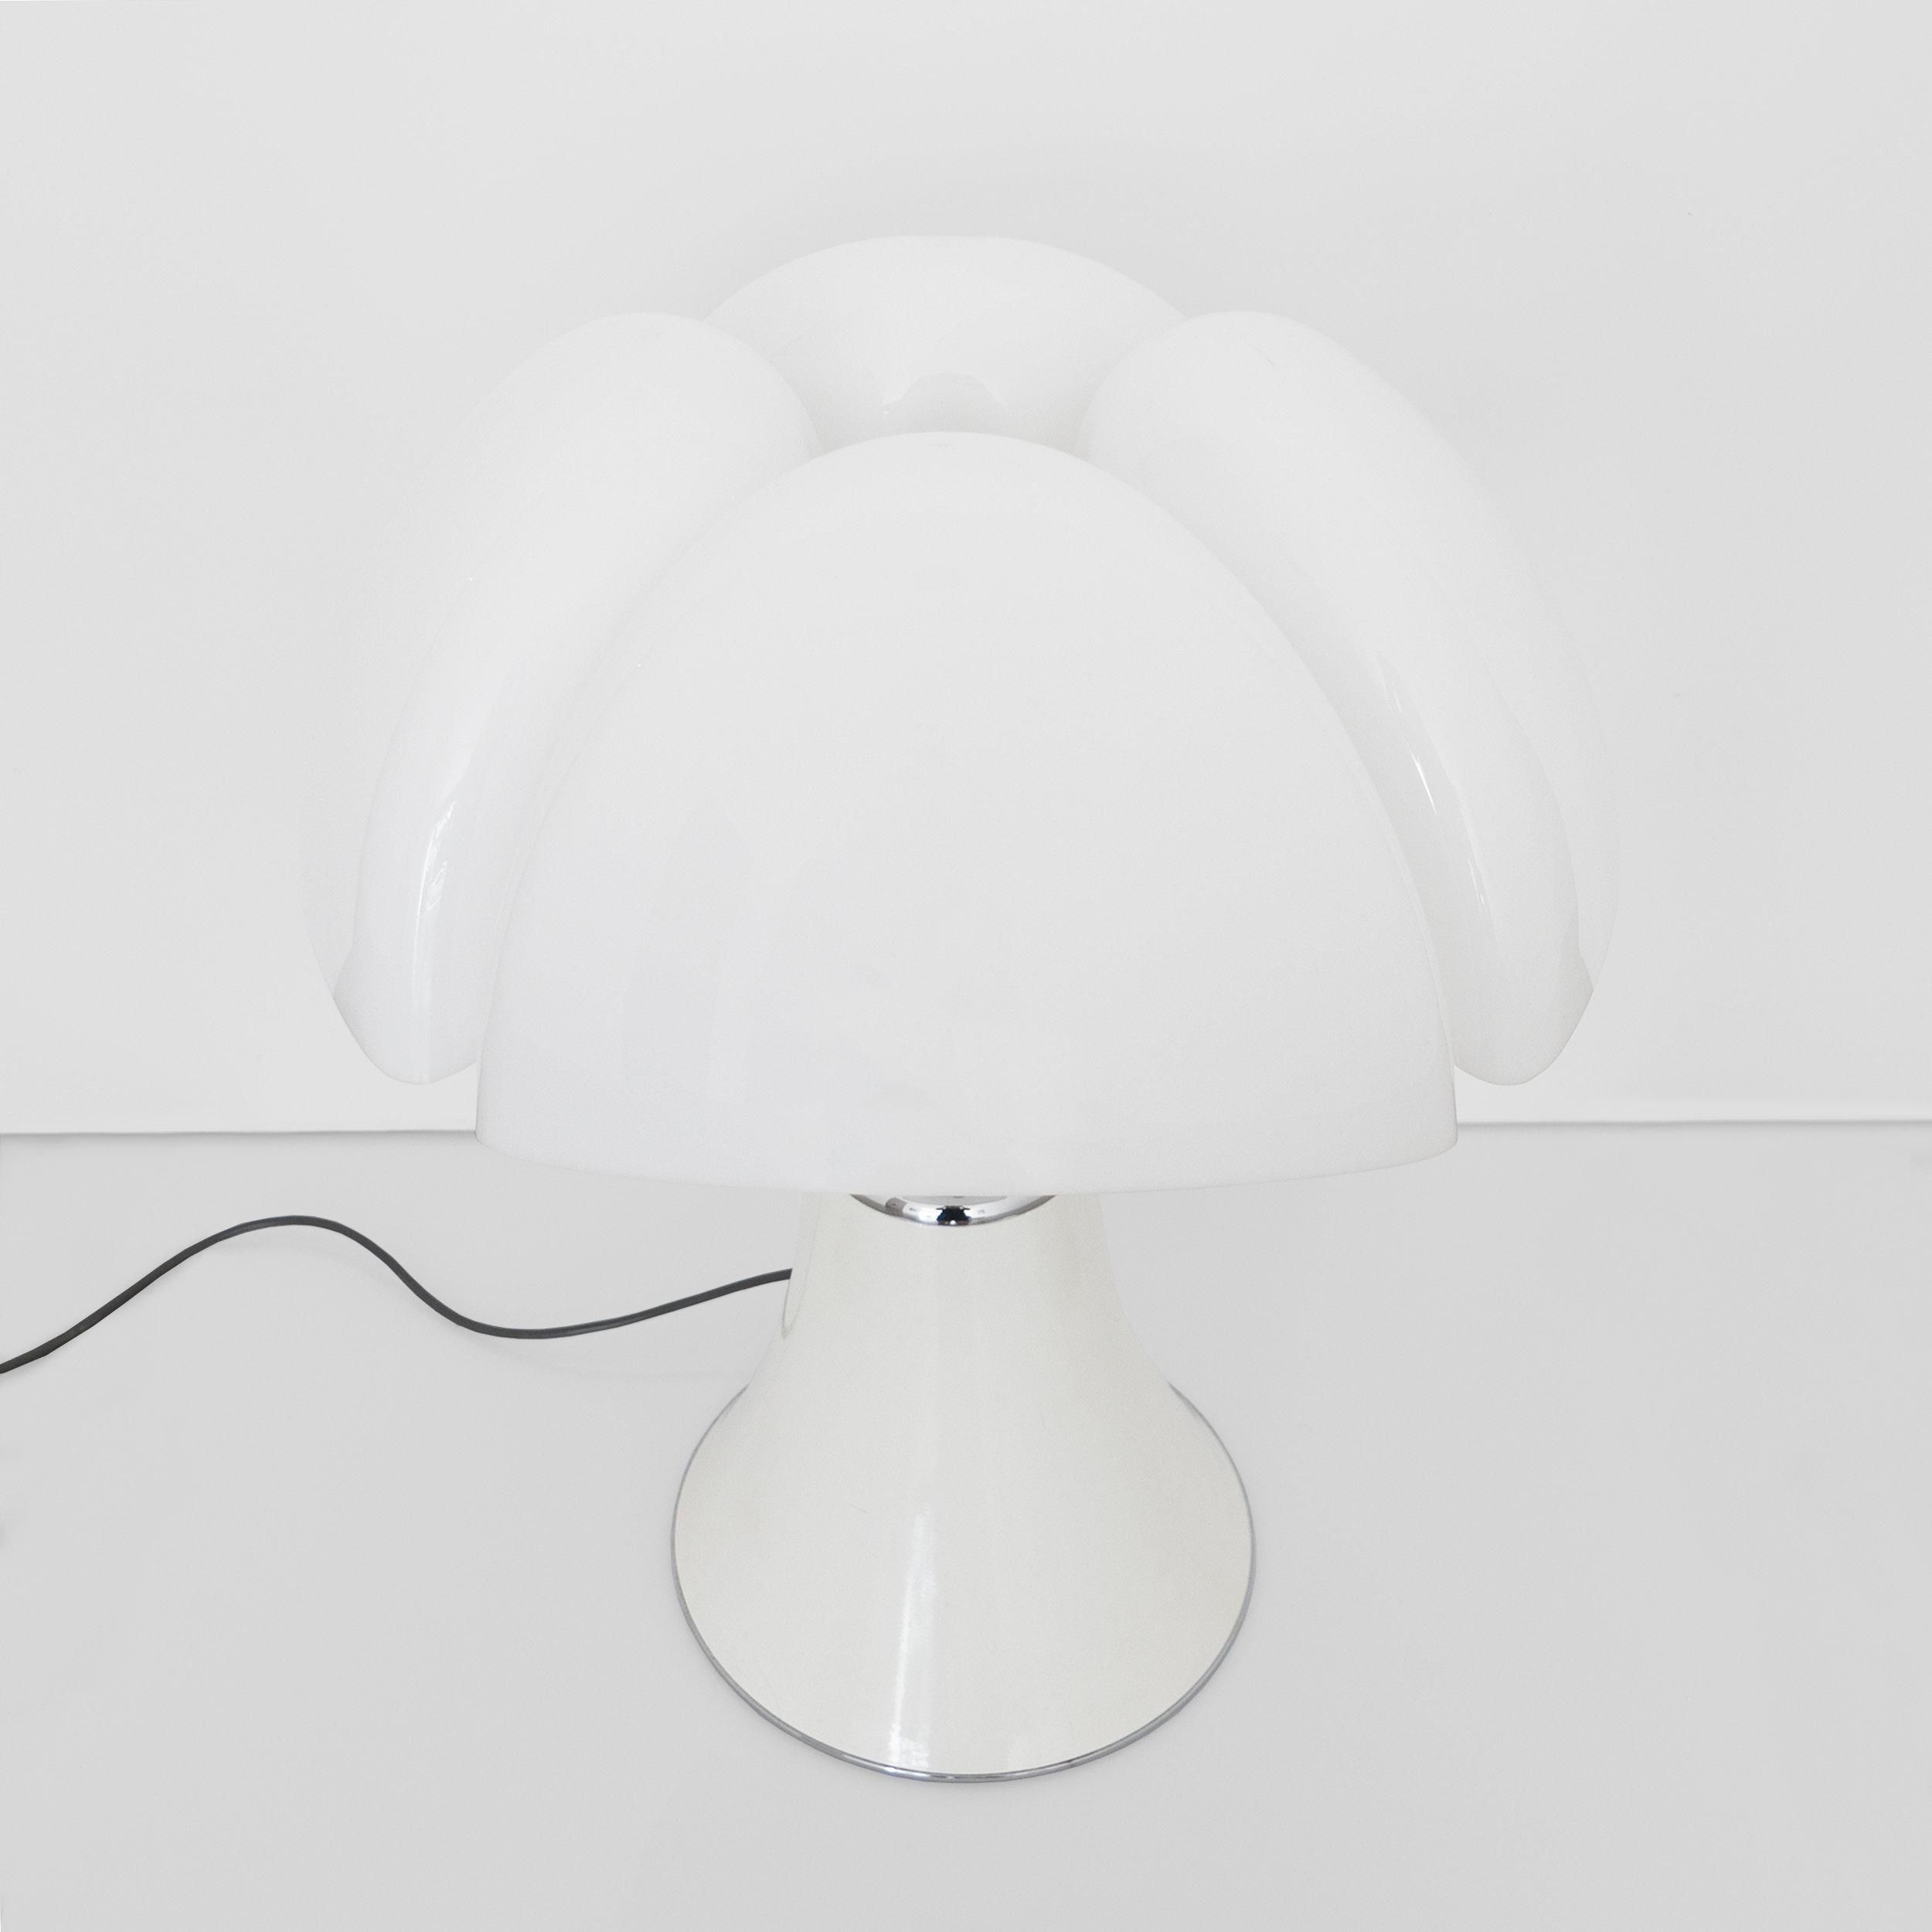 Gae Aulenti, Pipistrello Table Lamp Designed For Martinelli Luce, c. 1960s, Methacrylate, metal, 28 H x 21 Diameter inches_2.jpg